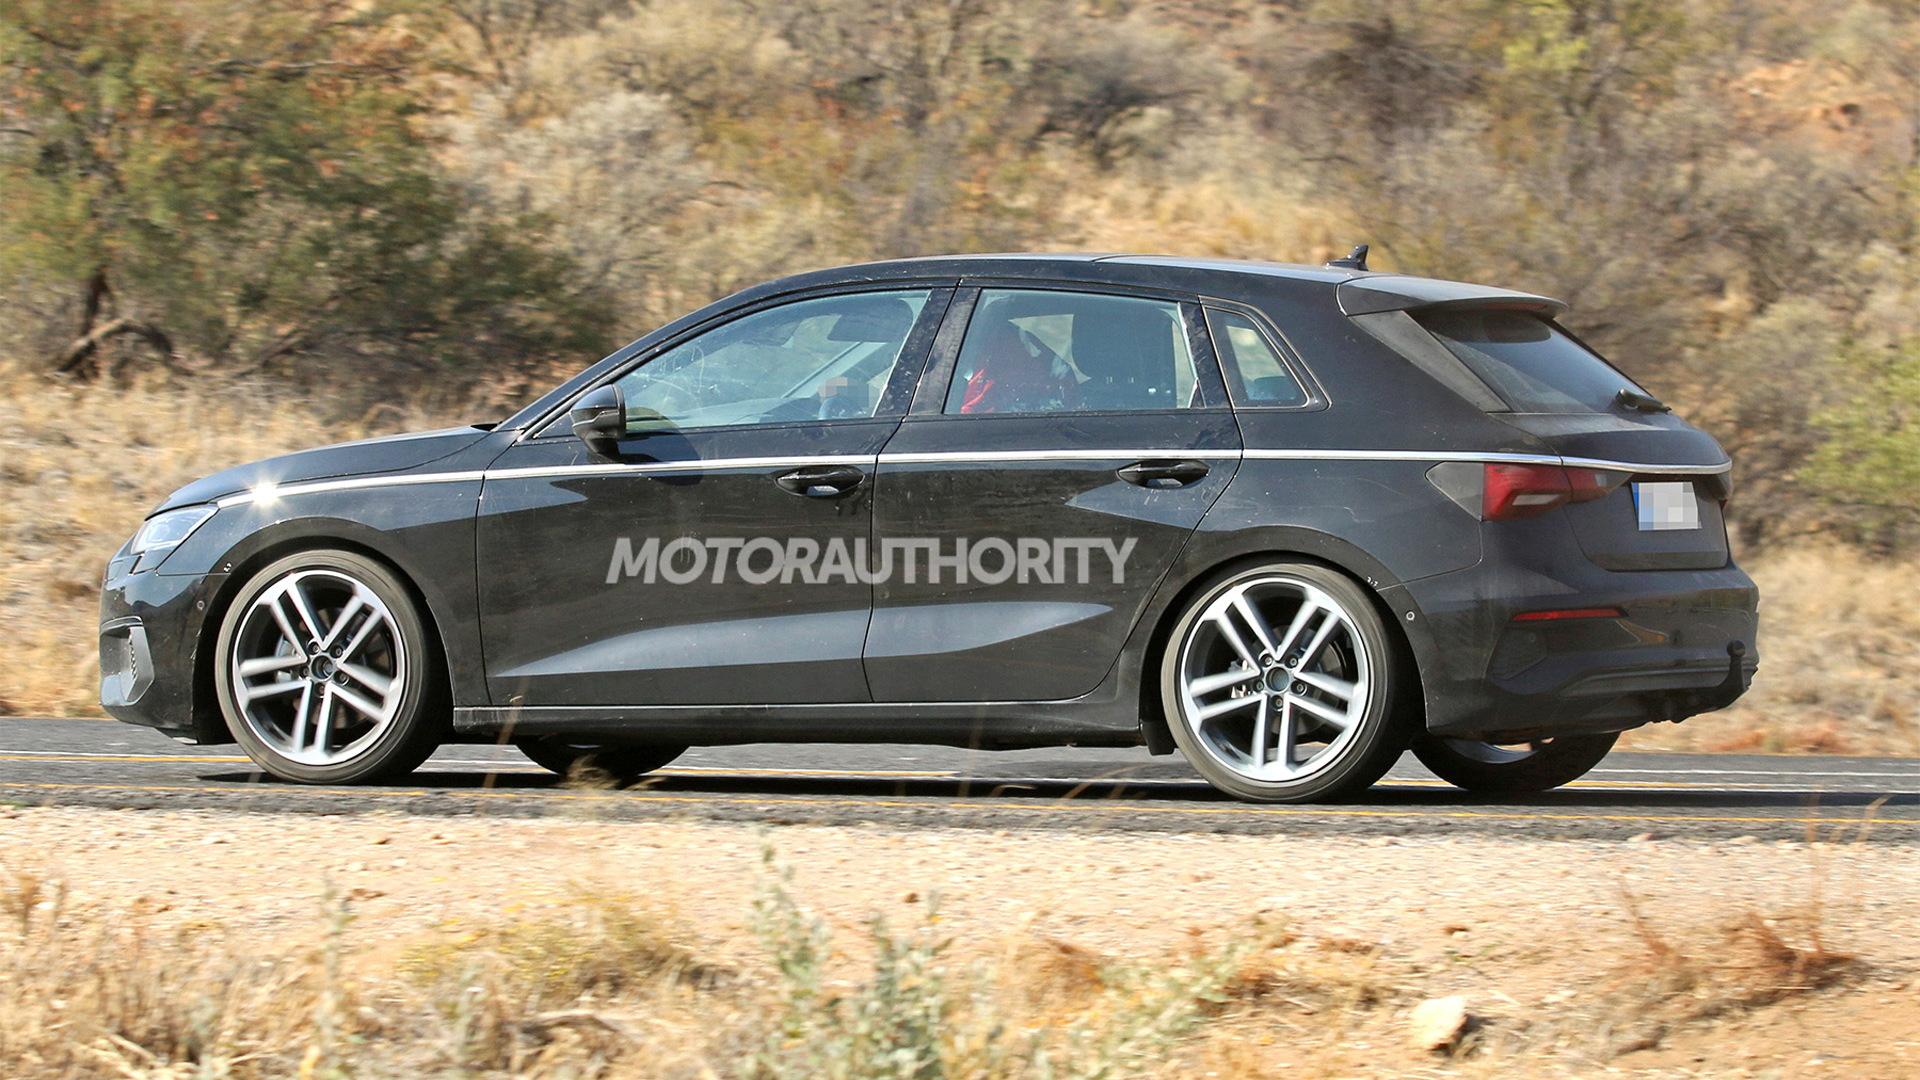 2021 Audi A3 Sportback spy shots - Photo credit: S. Baldauf/SB-Medien